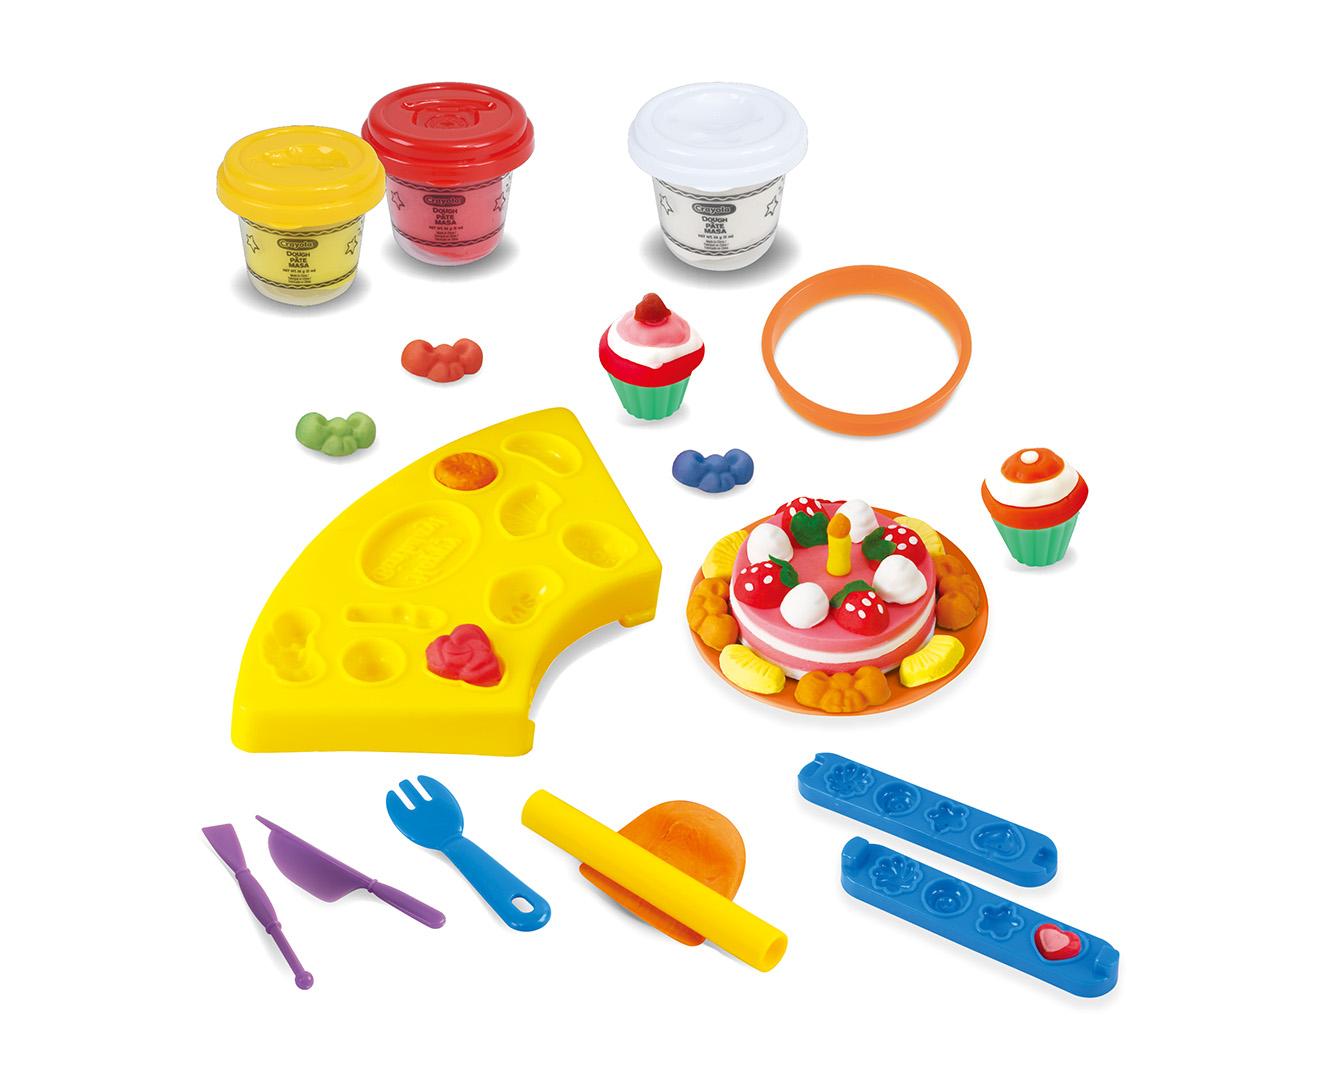 Crayola Modeling Dough Kit Baker S Delight Playset